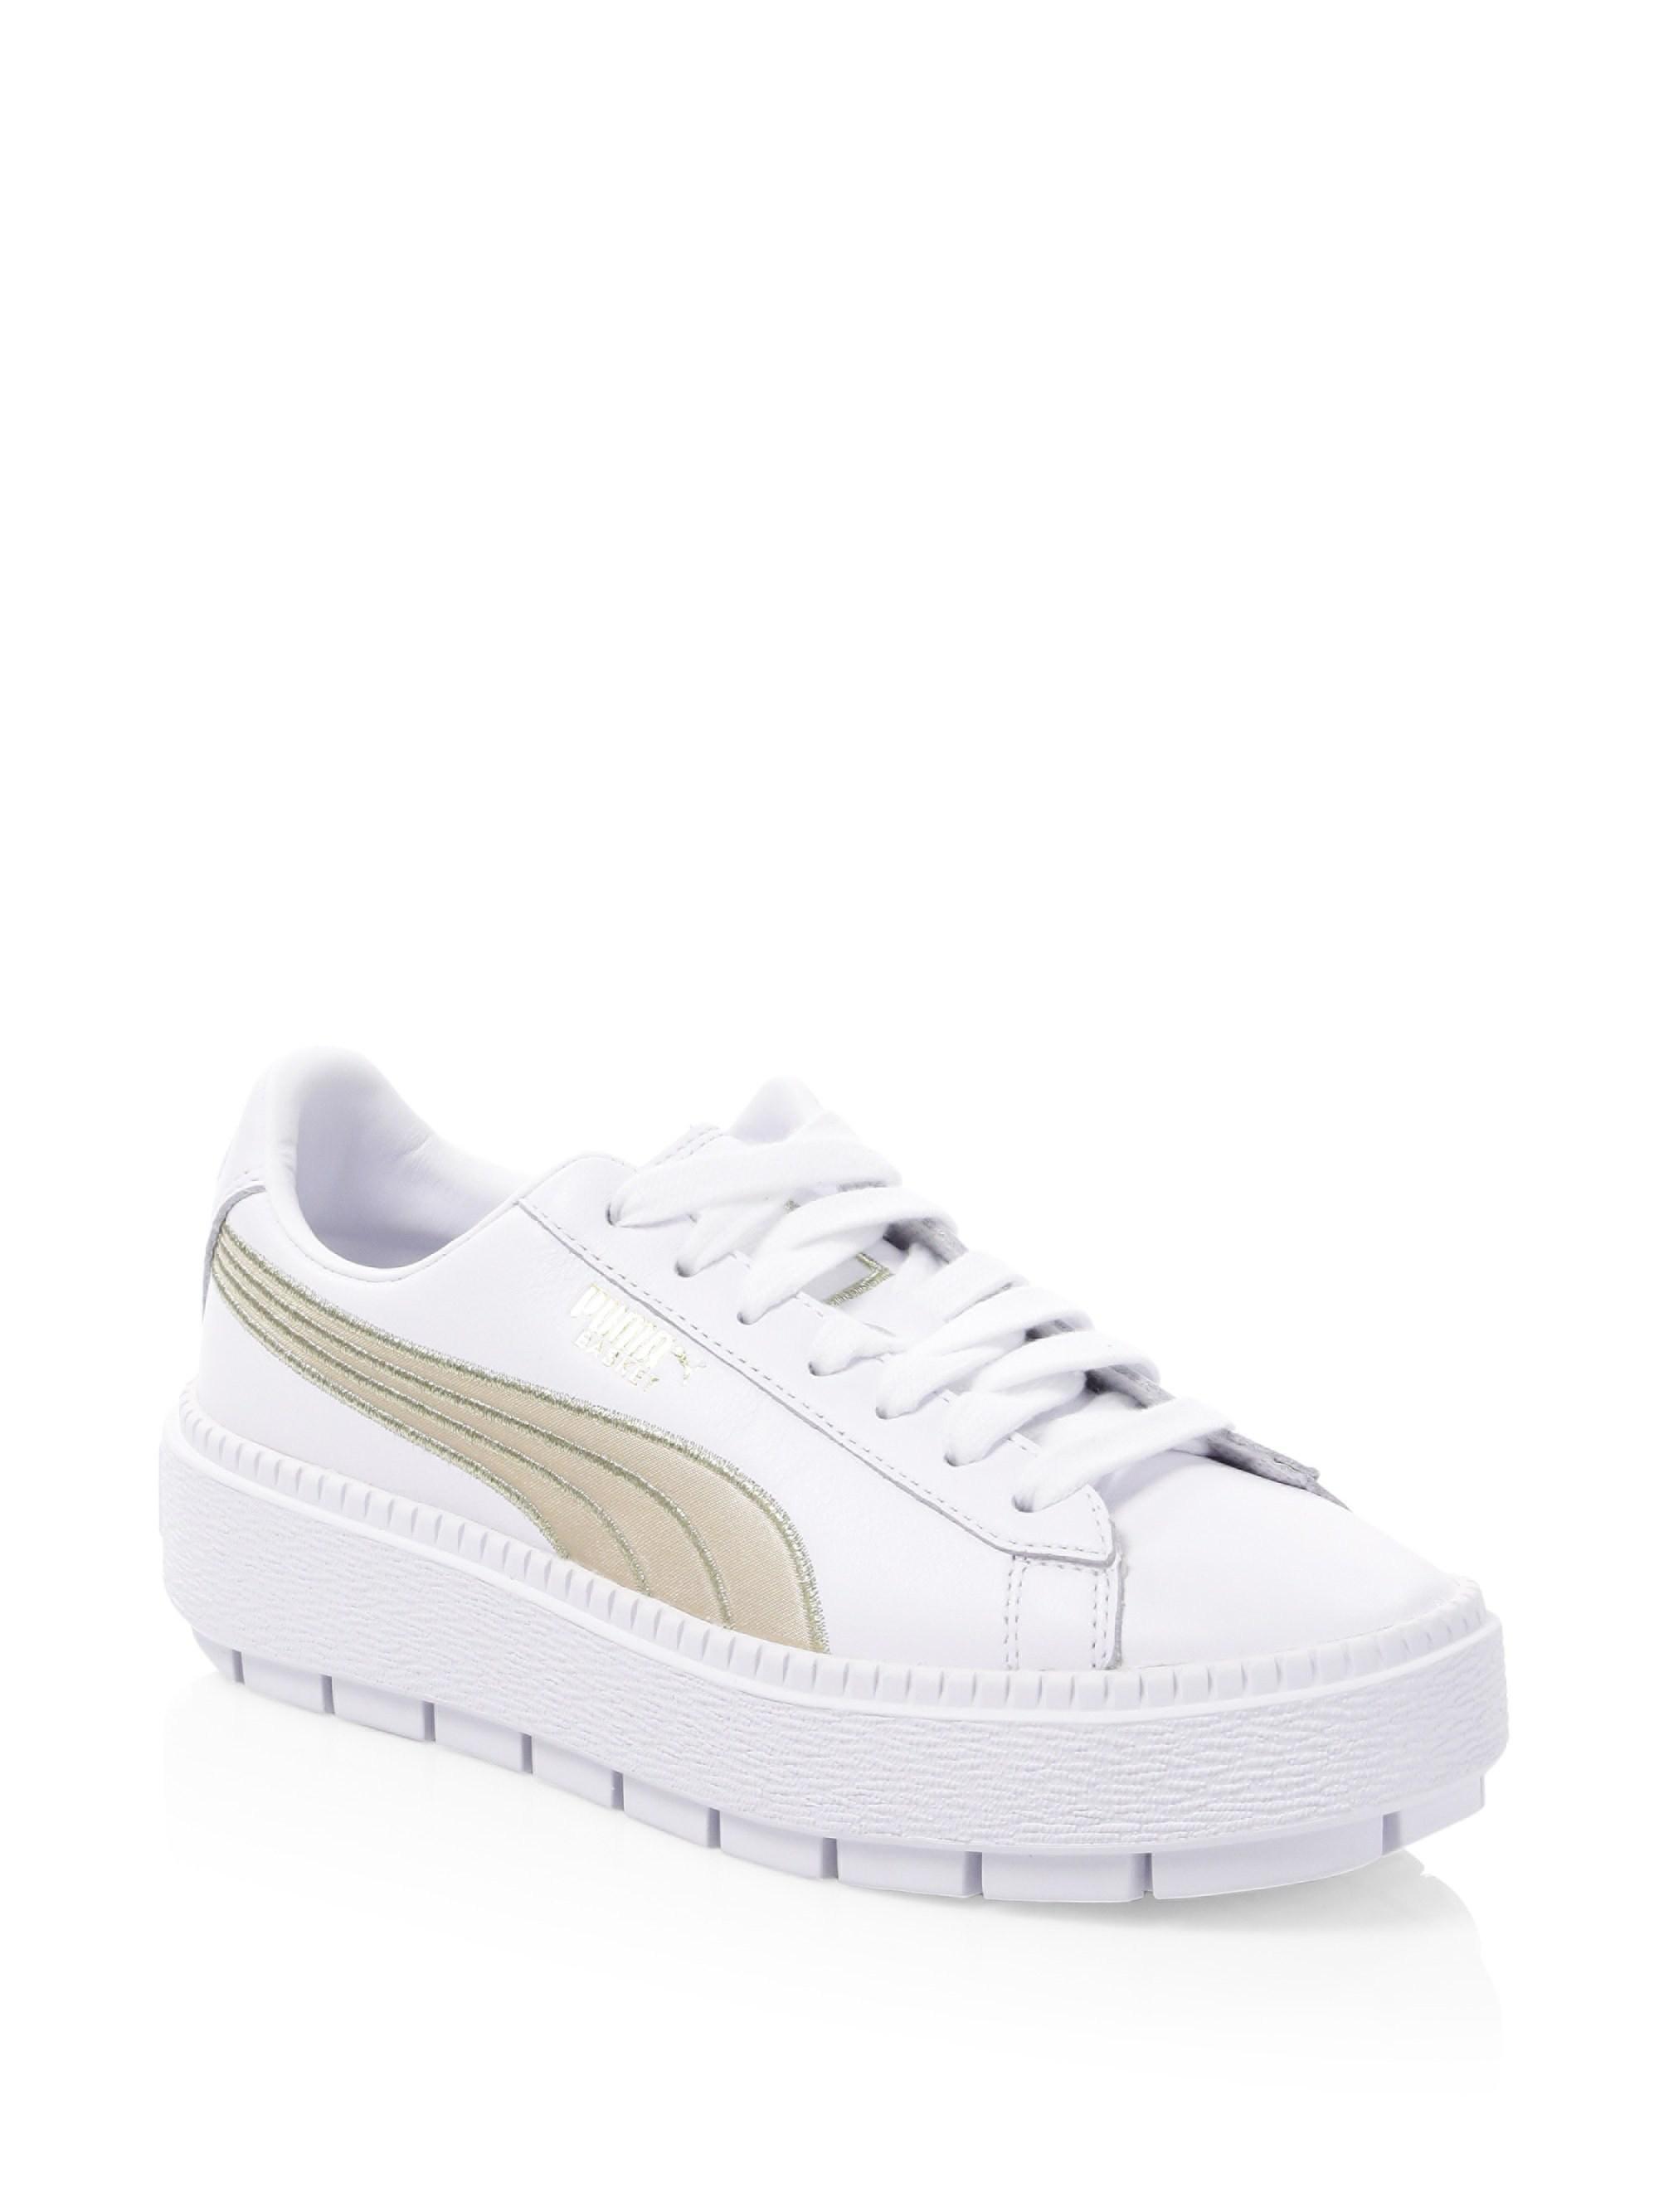 0c8fd380231 PUMA Platform Trace Varsity Sneakers in White - Lyst